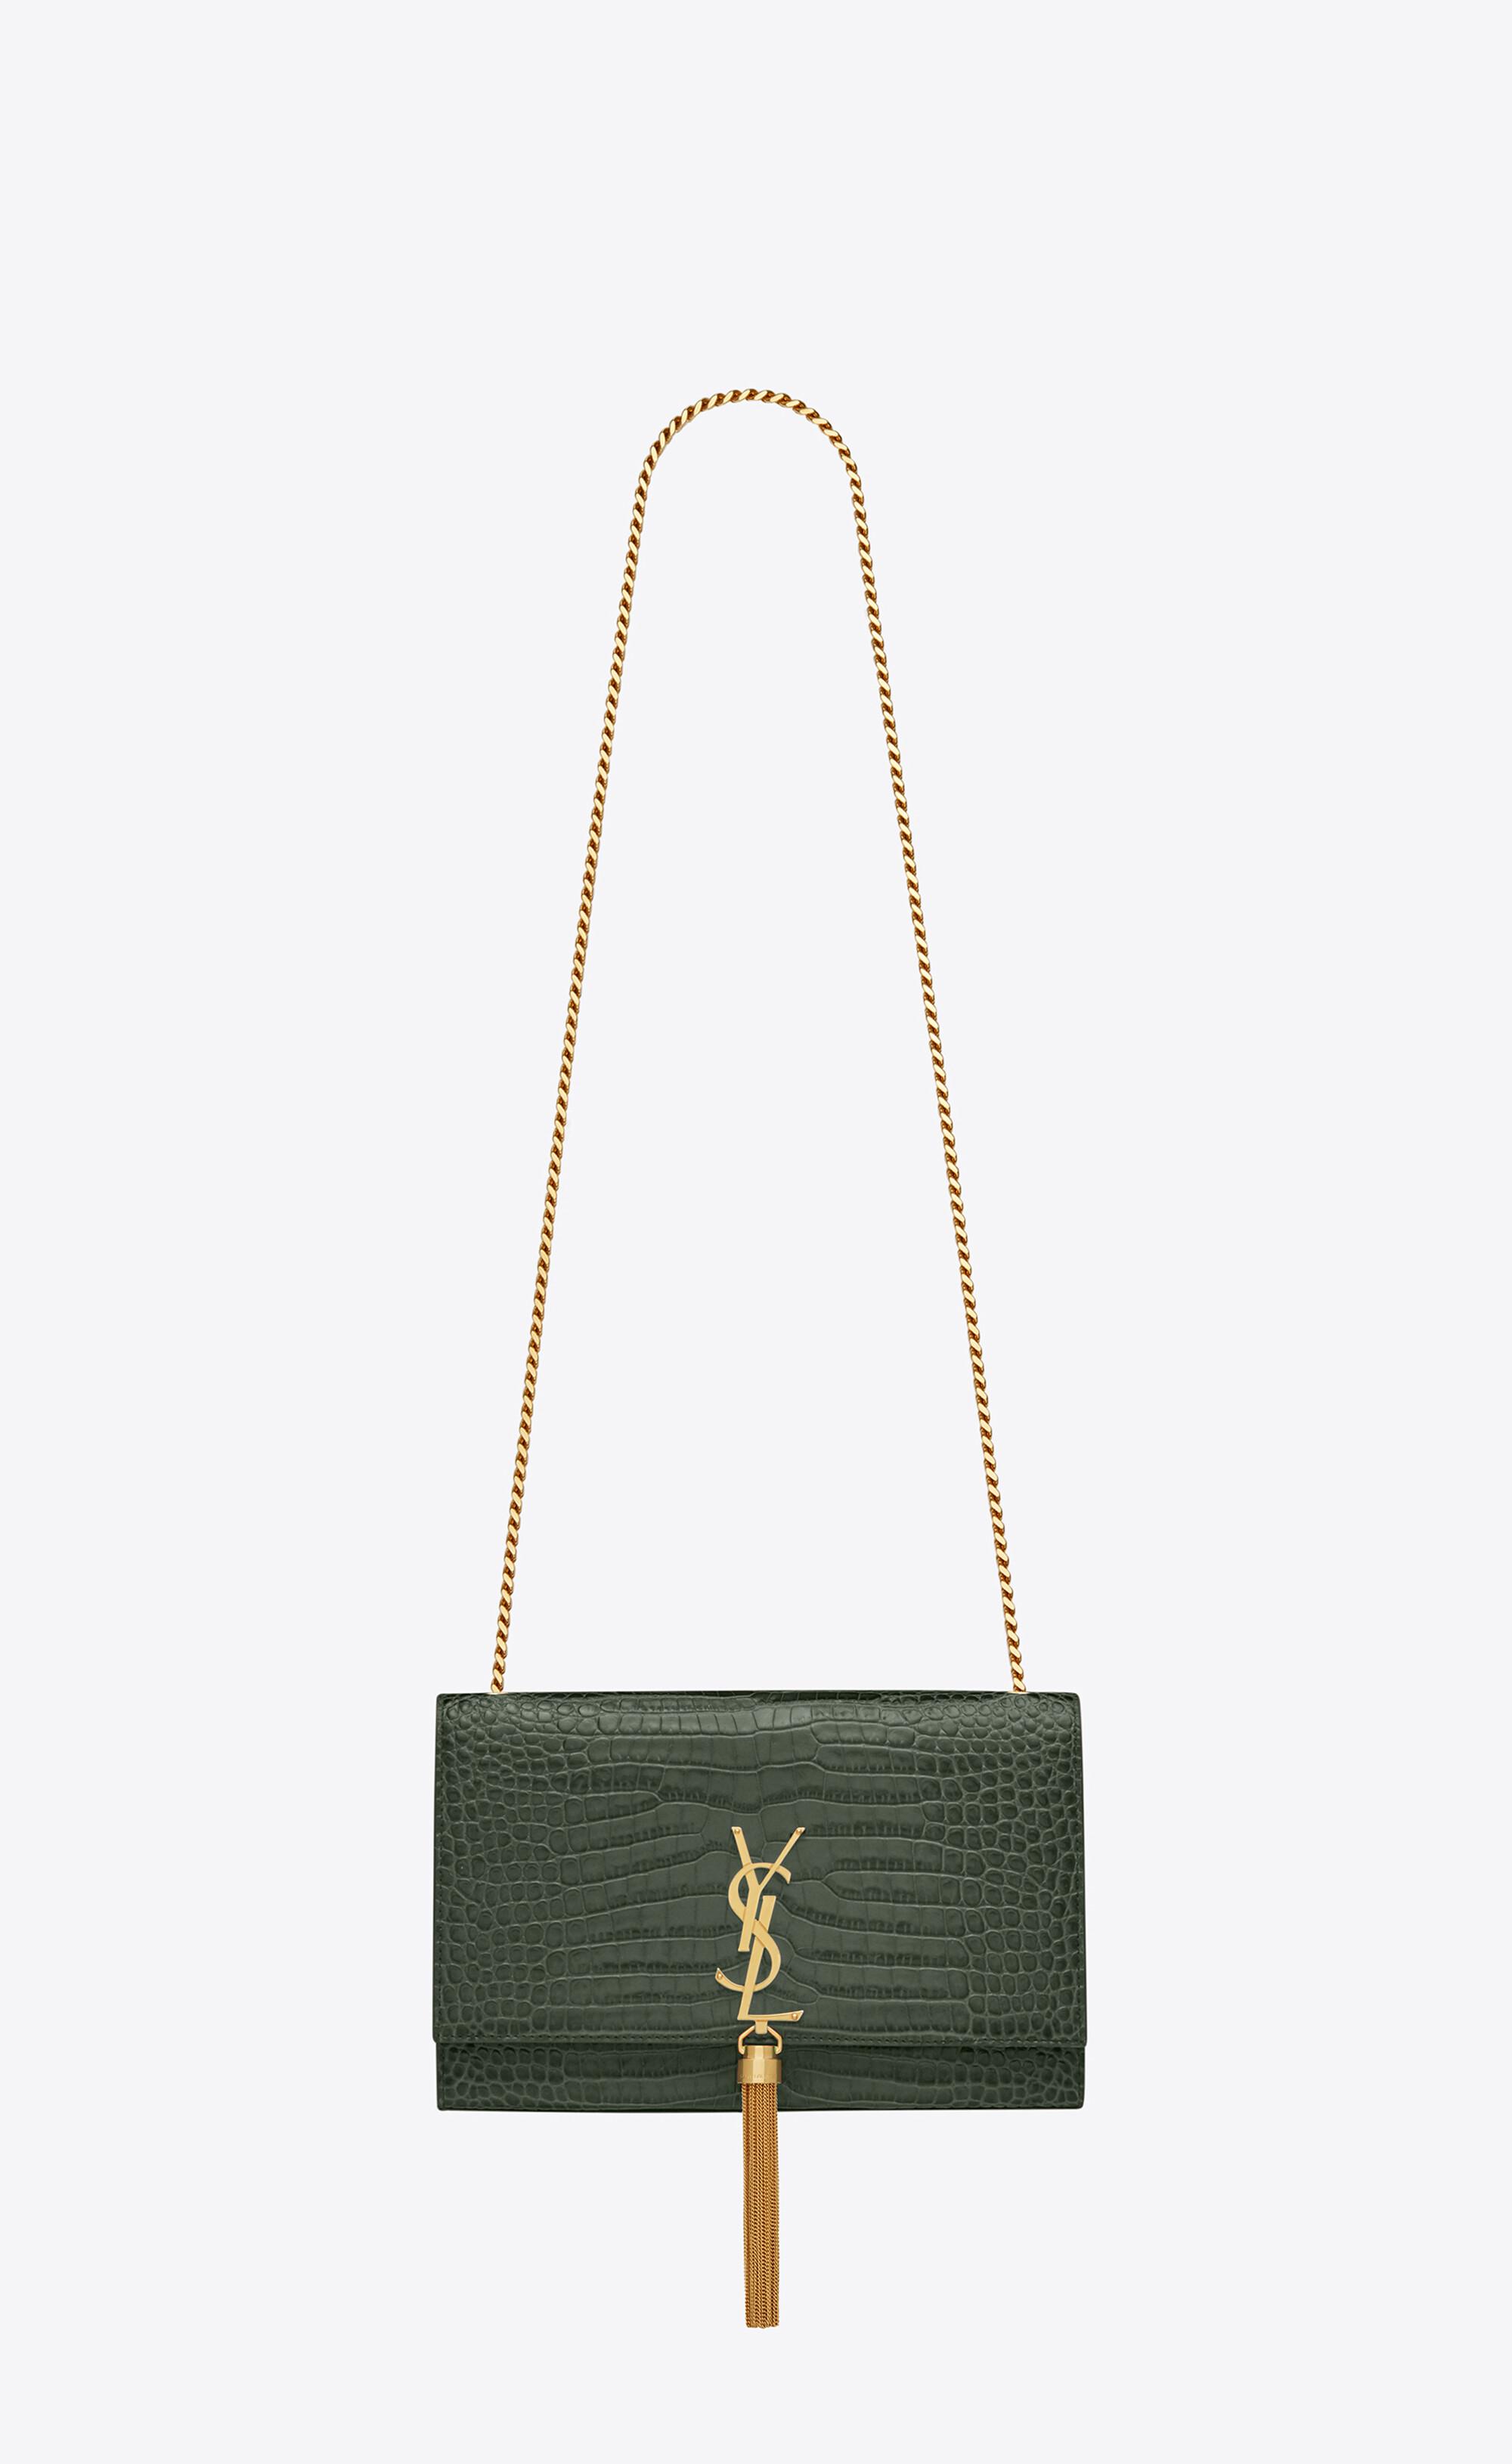 KEROUSIDEN Simple Canvas Double Shoulder Bag Female Wild New Born Schoolbag Backpack Mens Width 30D 13-43 Green